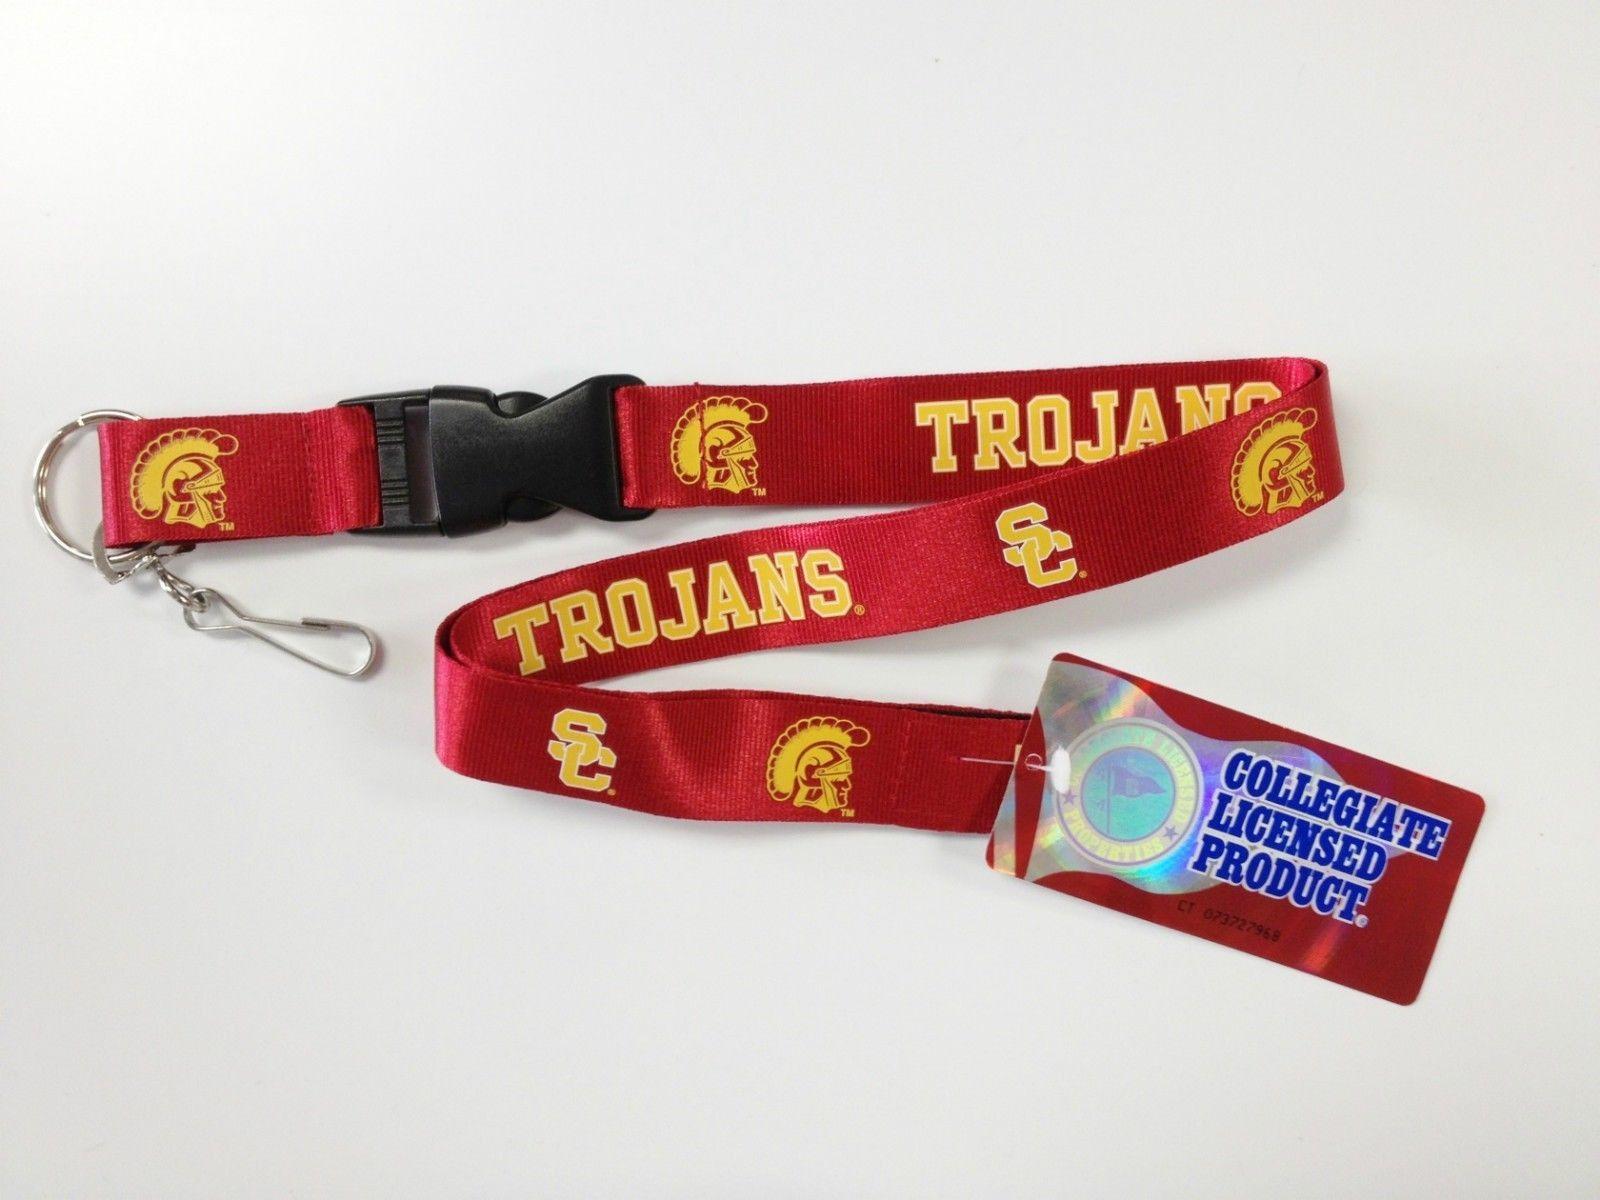 USC TROJANS TEAM LOGO LANYARD KEY CHAIN TICKET HOLDER NCAA